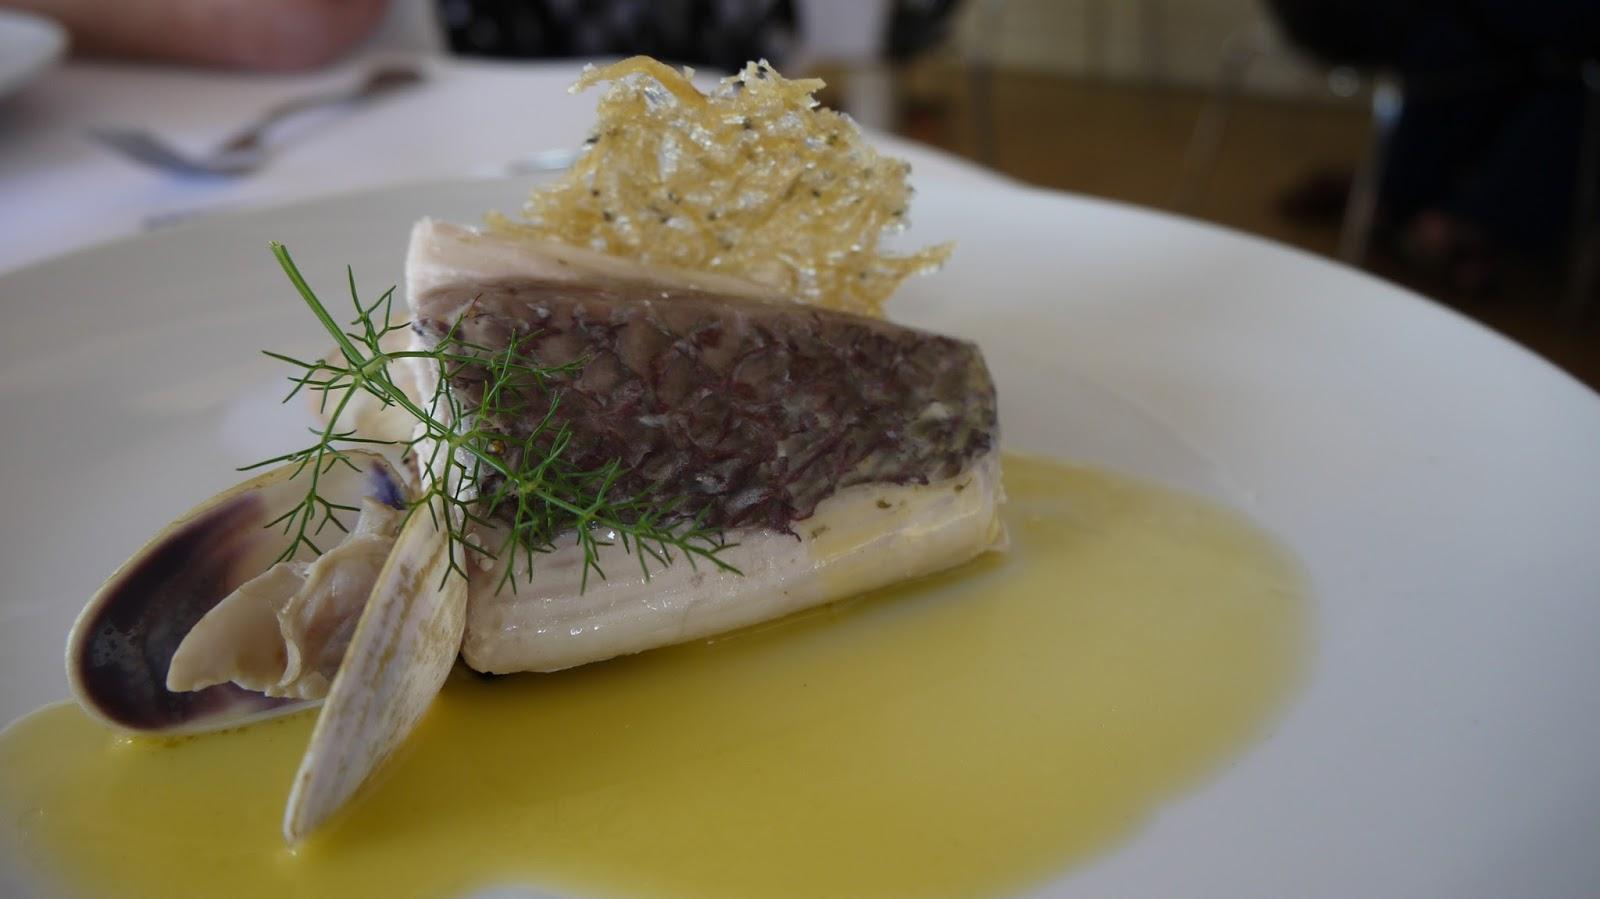 Star of Greece, Pt Willunga, Fleurieu Peninsula, Beach, SA, Adelaide, Modern Australian, Steak, Seafood, Fish,